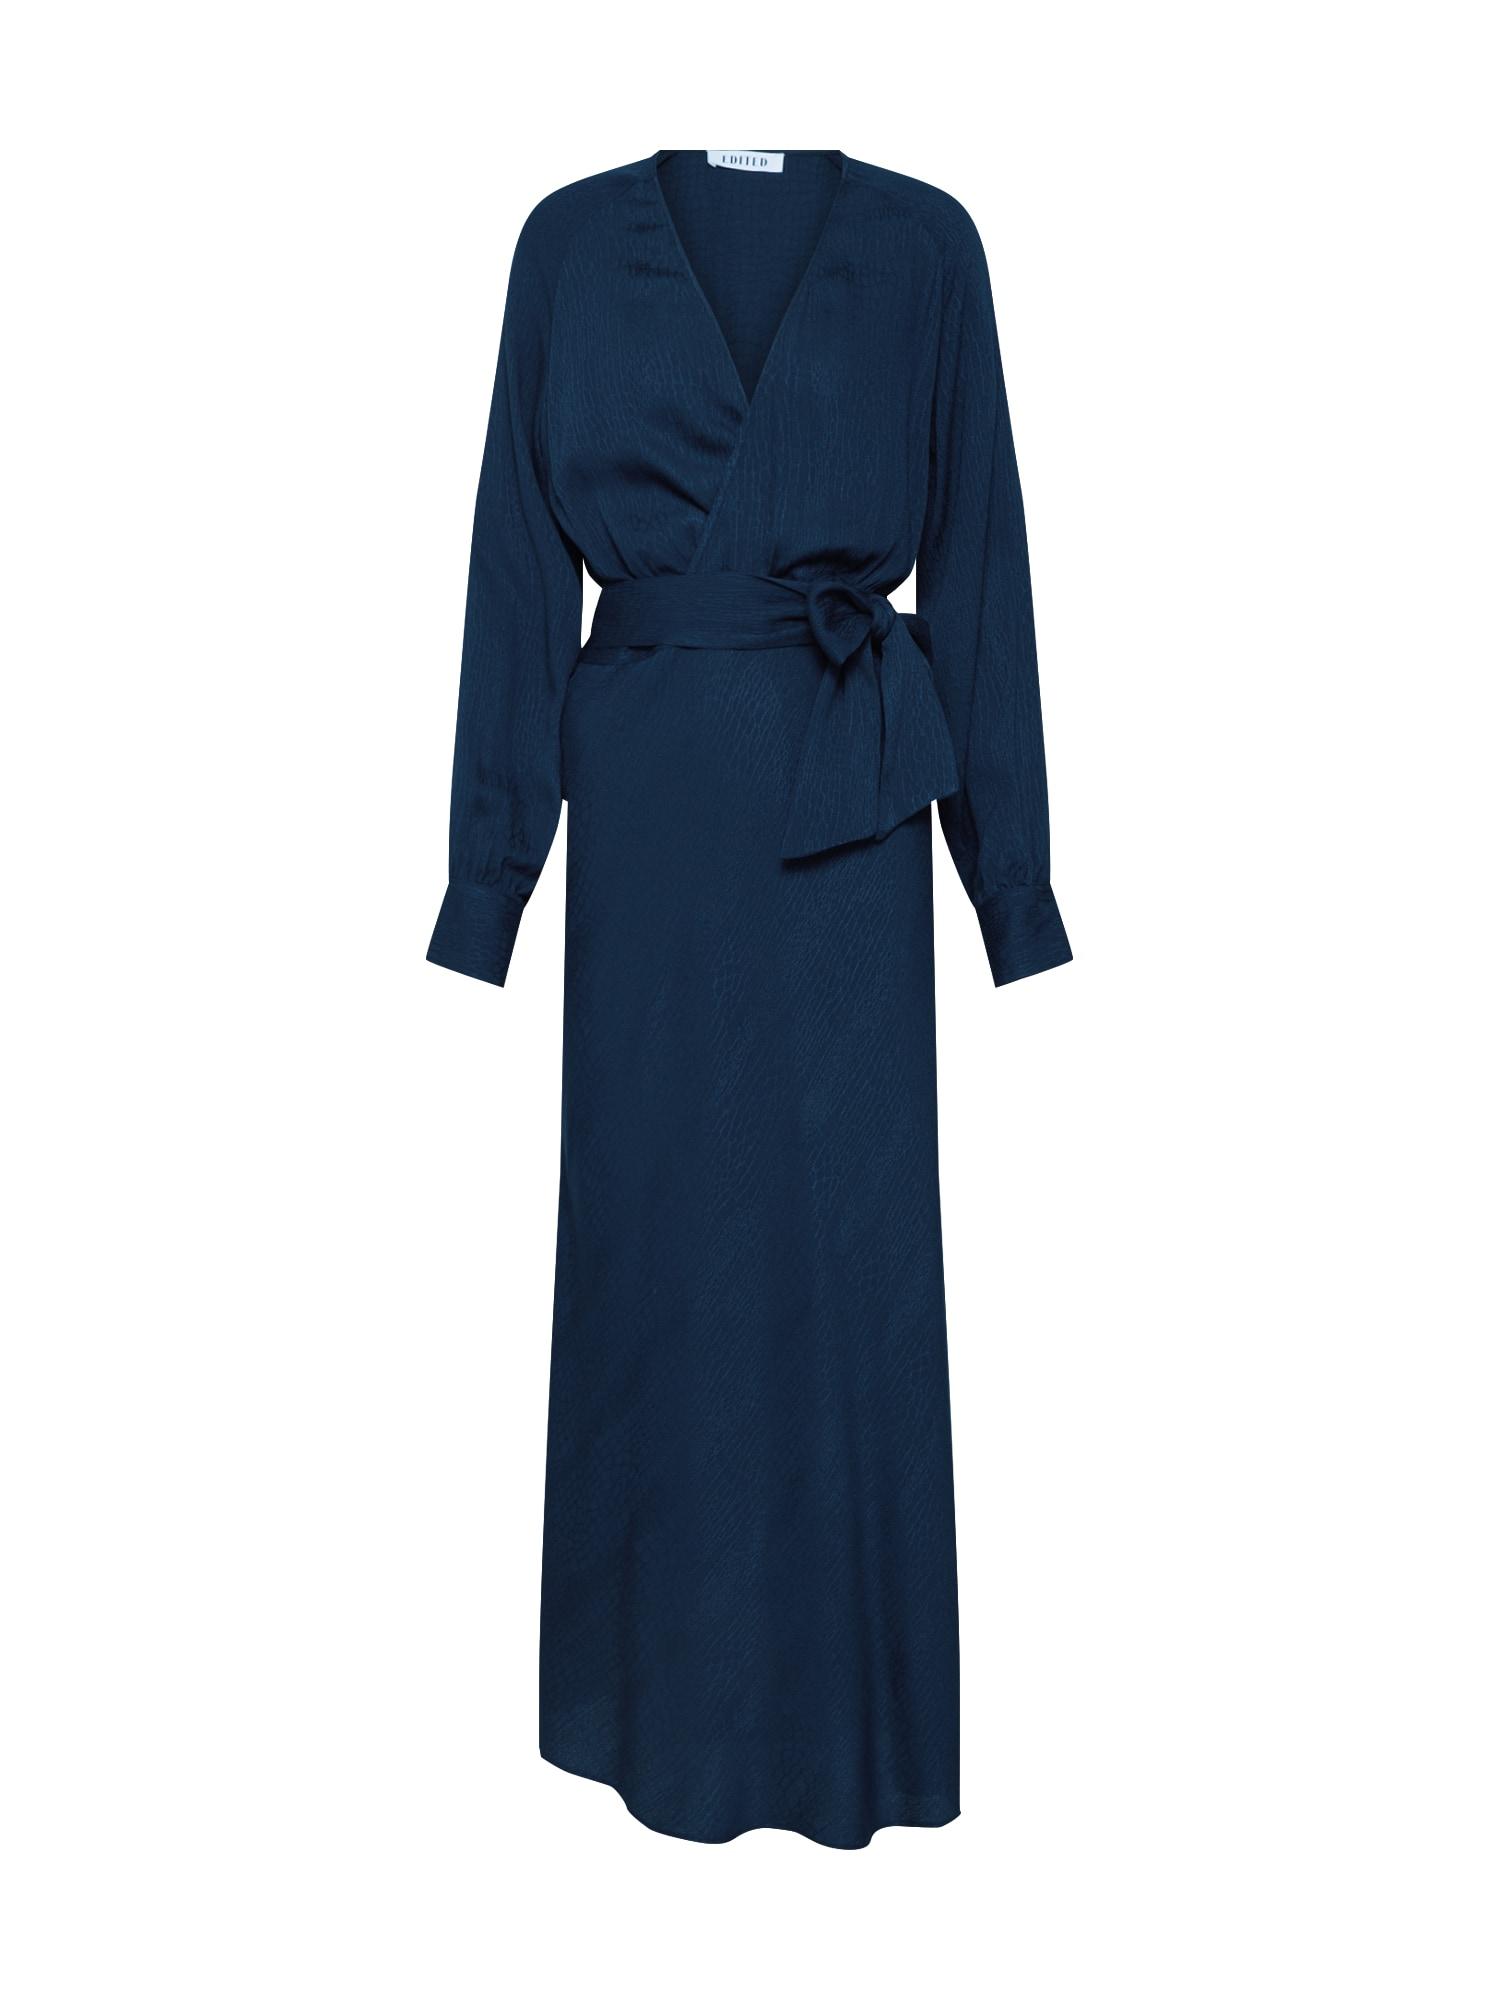 EDITED Sukienka koktajlowa 'Alencia'  niebieski